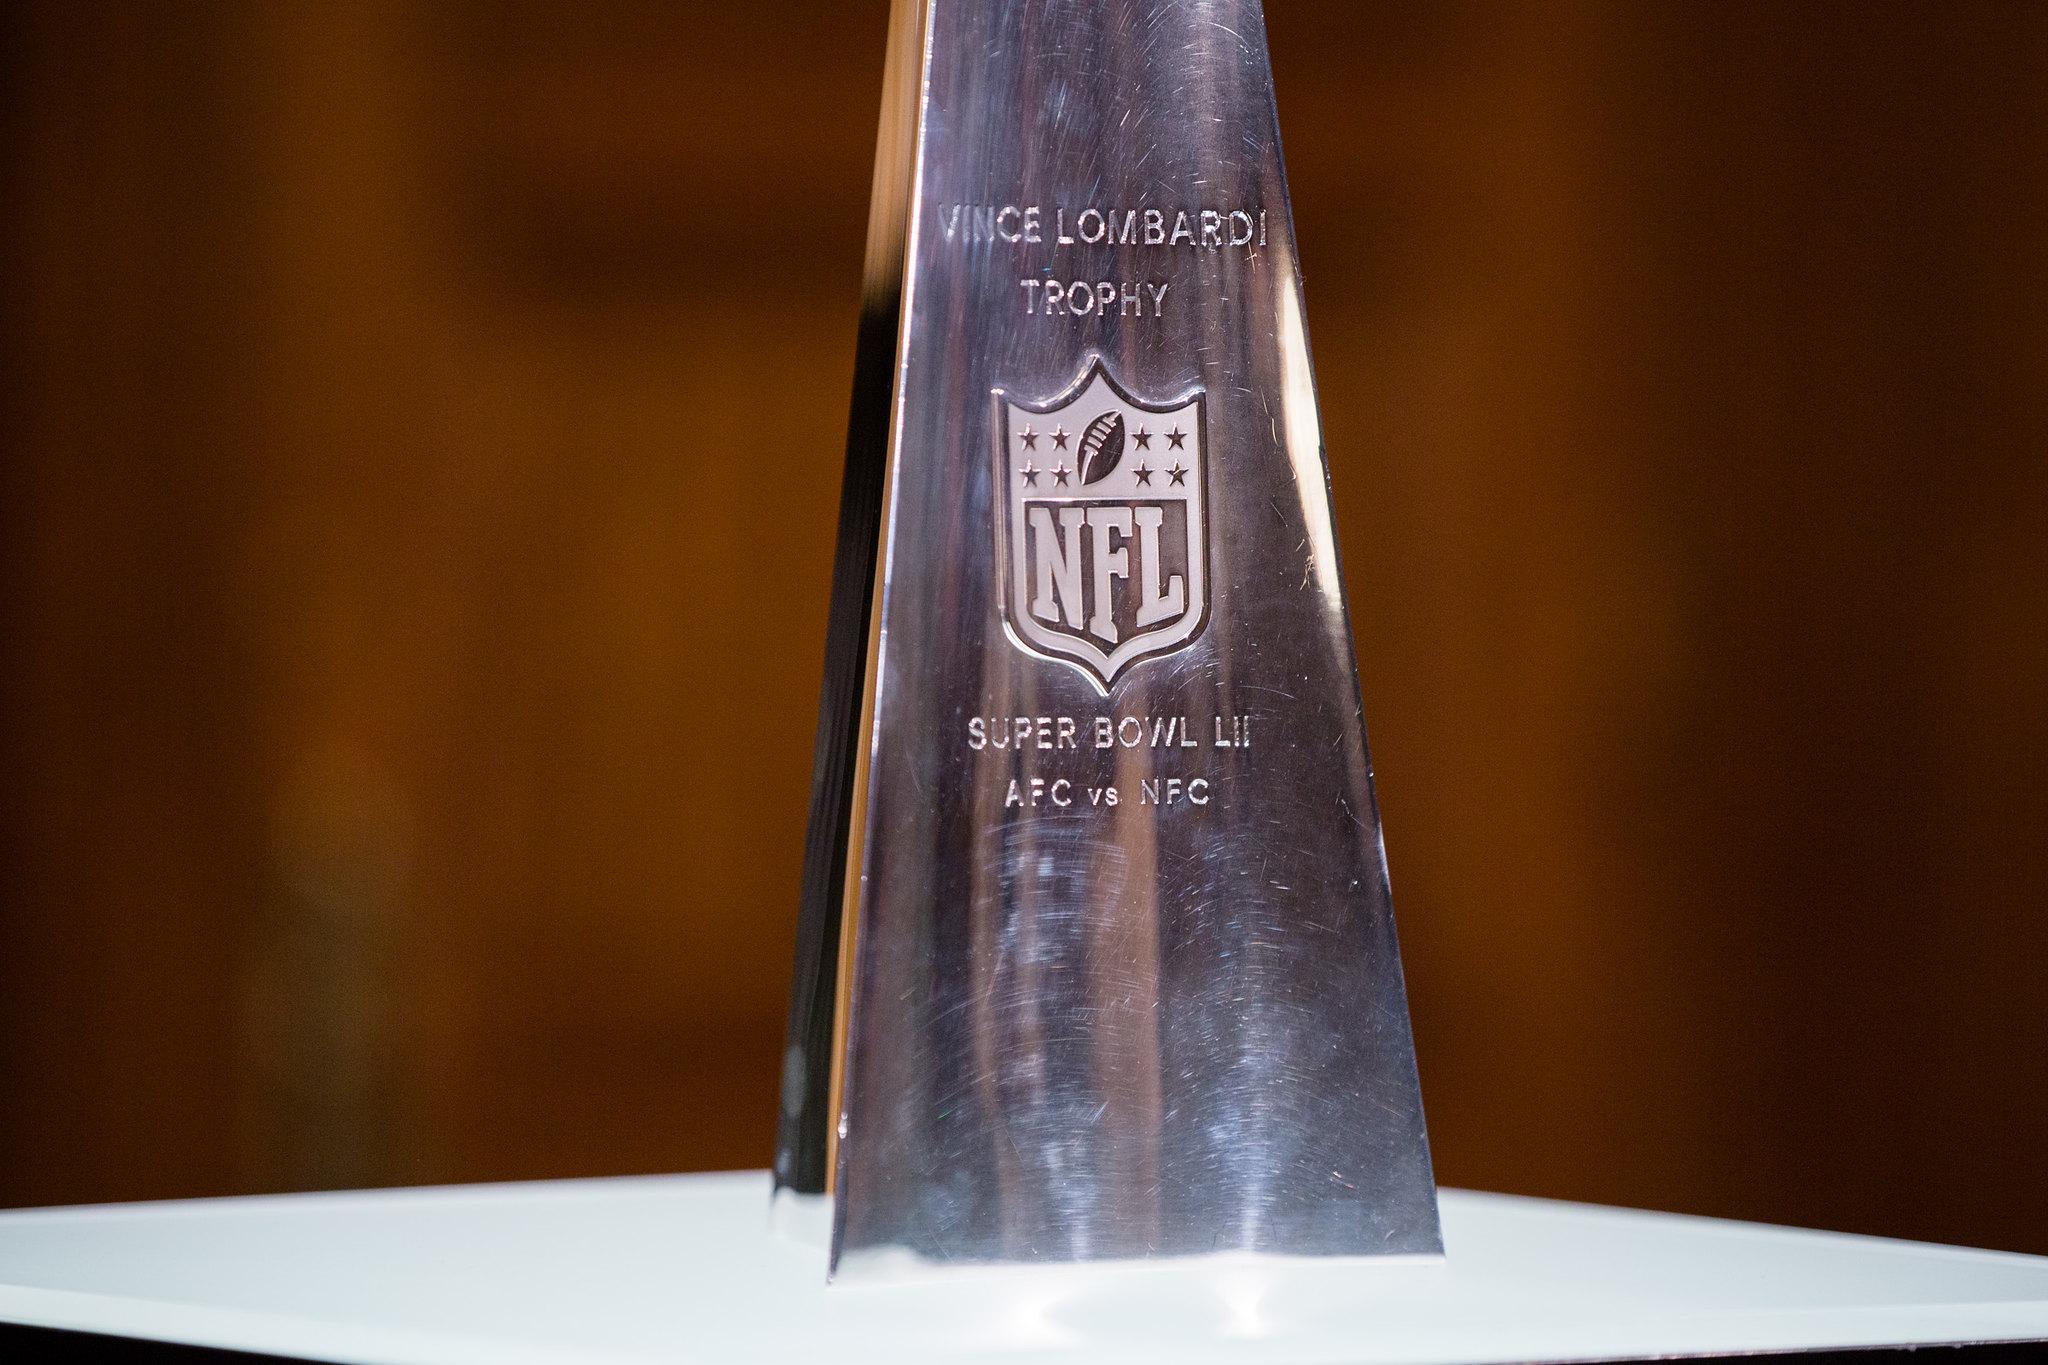 Vince Lombardi Trophy Visits the Pennsylvania Capitol